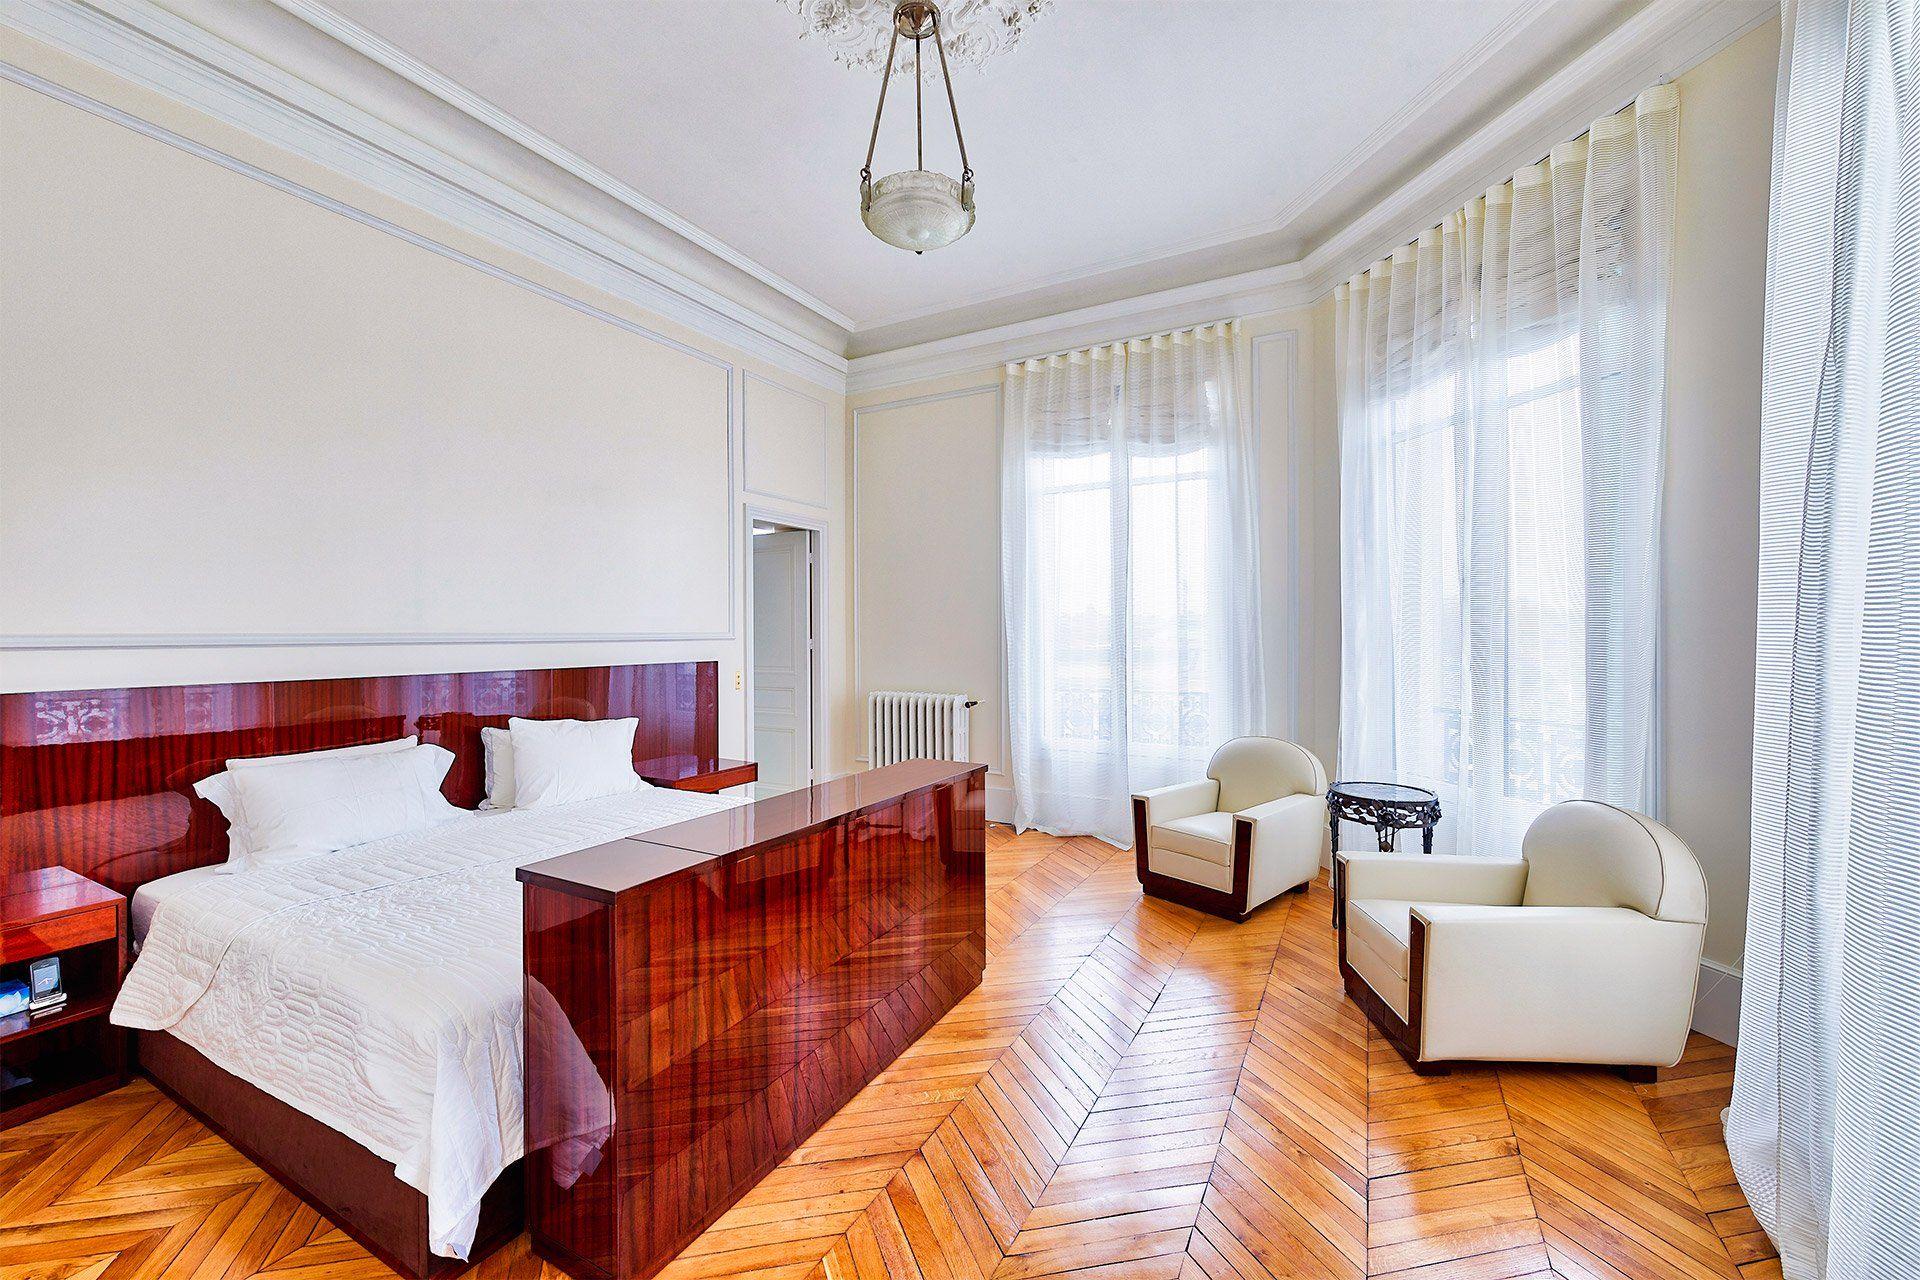 Magnificent 4 bed, 4 bath long term rental near Musée d